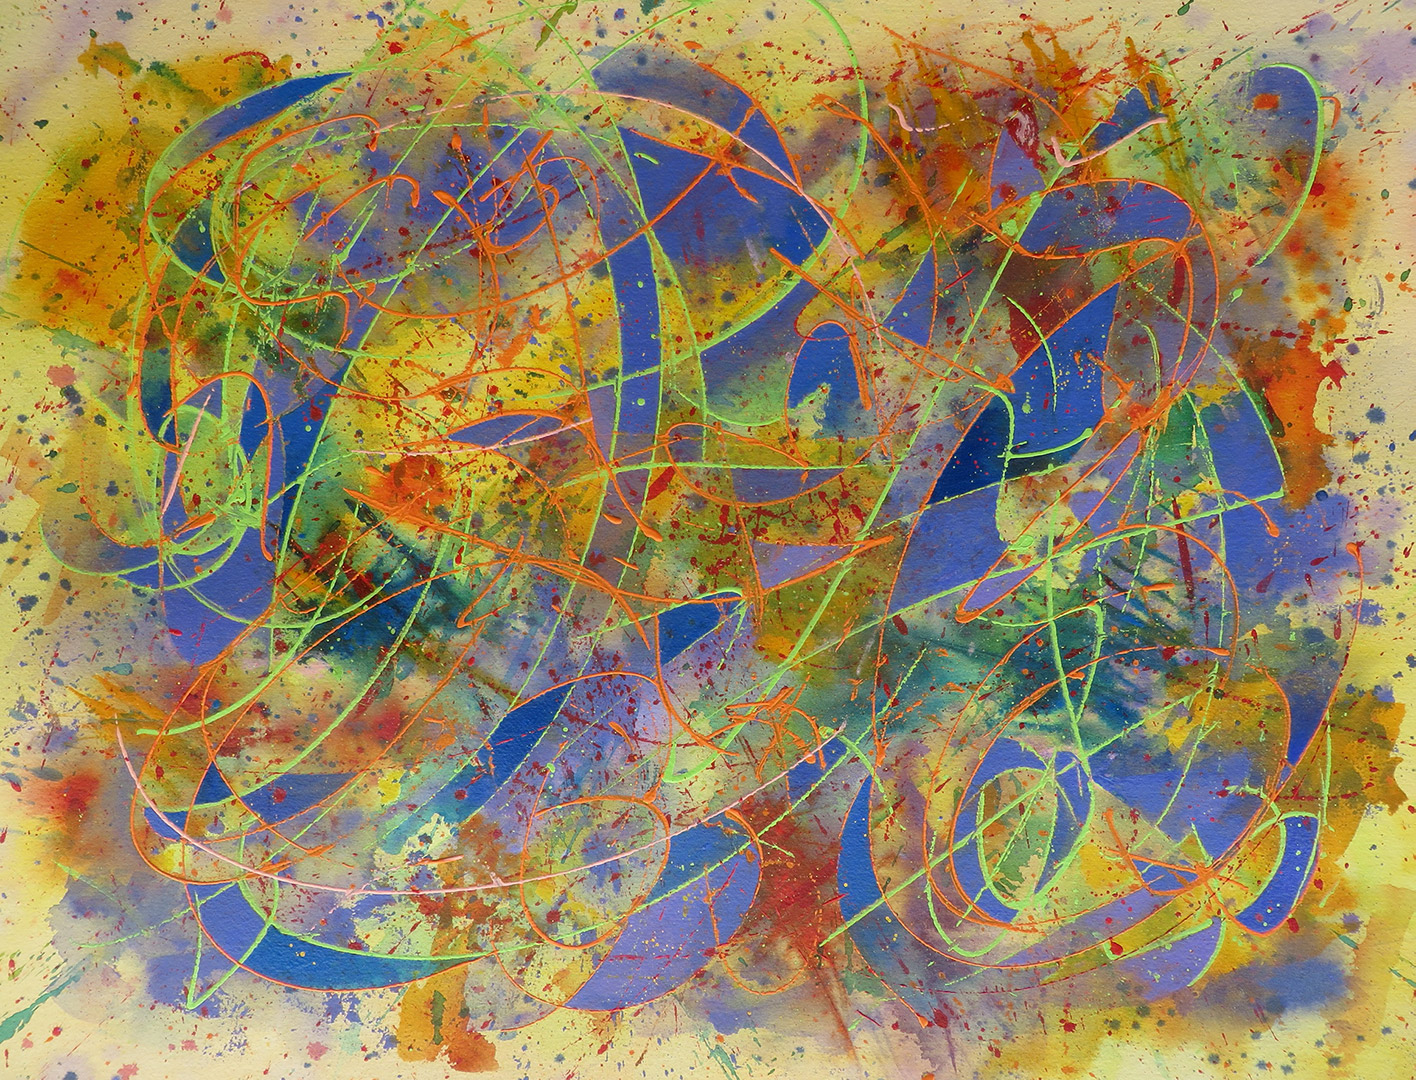 Ron Howlett - Cosmic Landscape